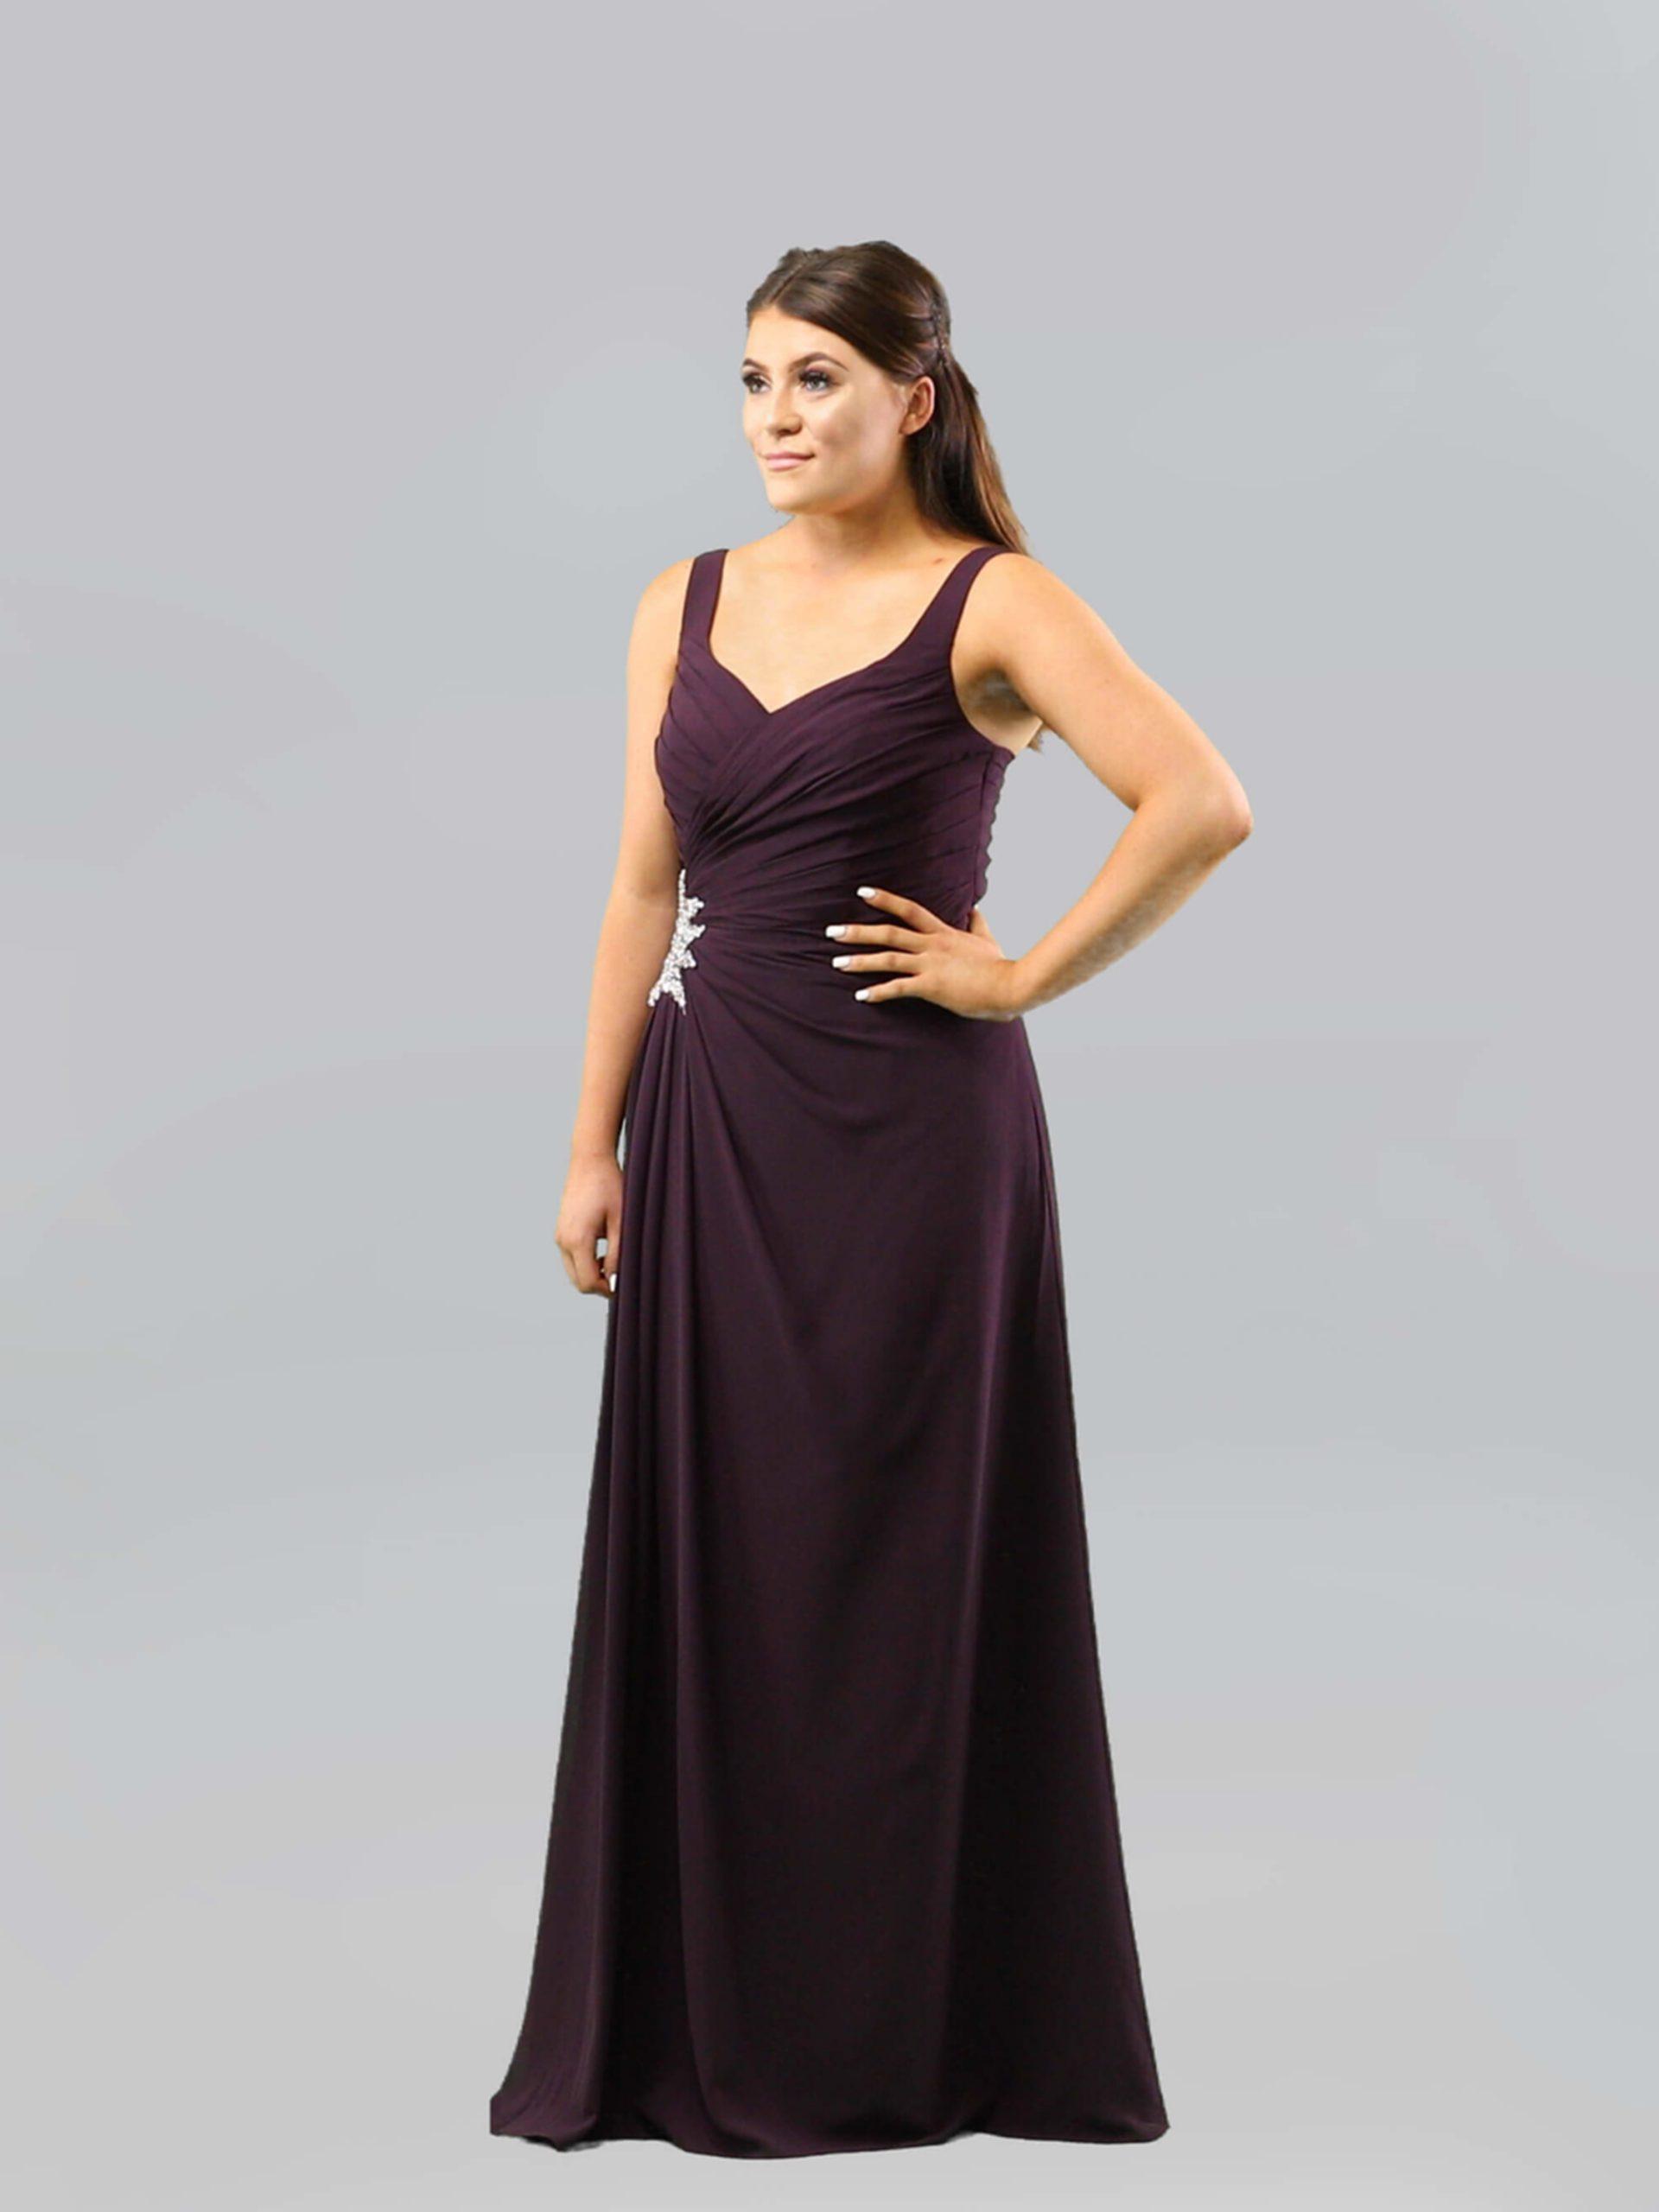 MAB05-plum chiffon bridesmaid dress 1